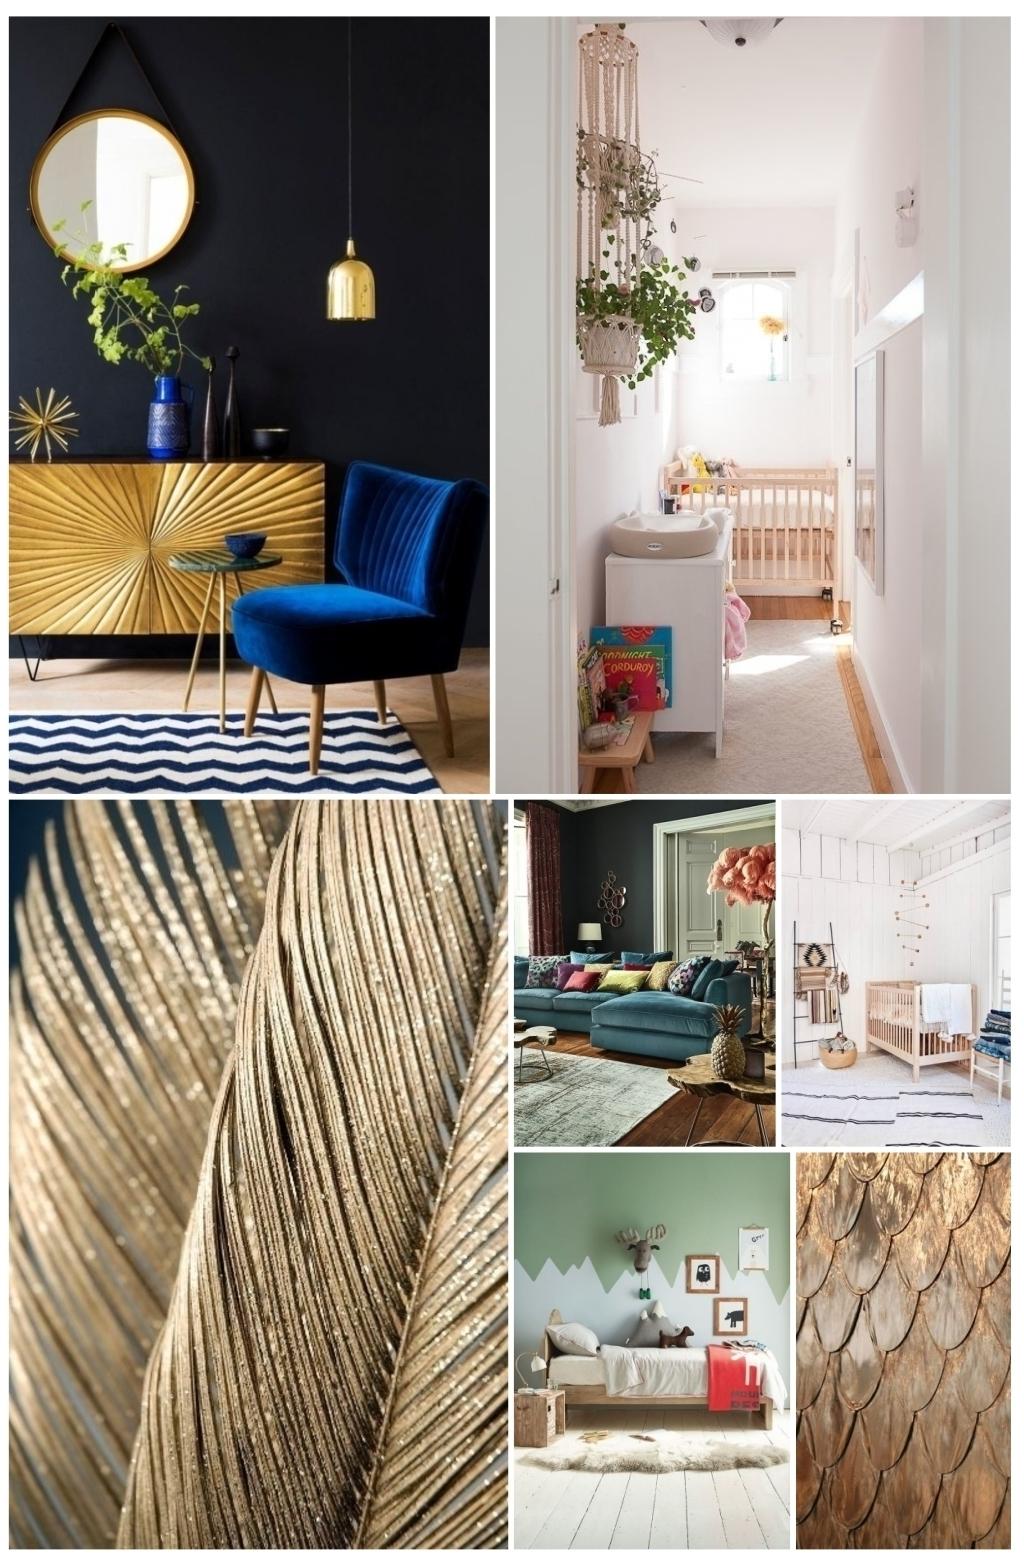 Interior design Trends for 2018